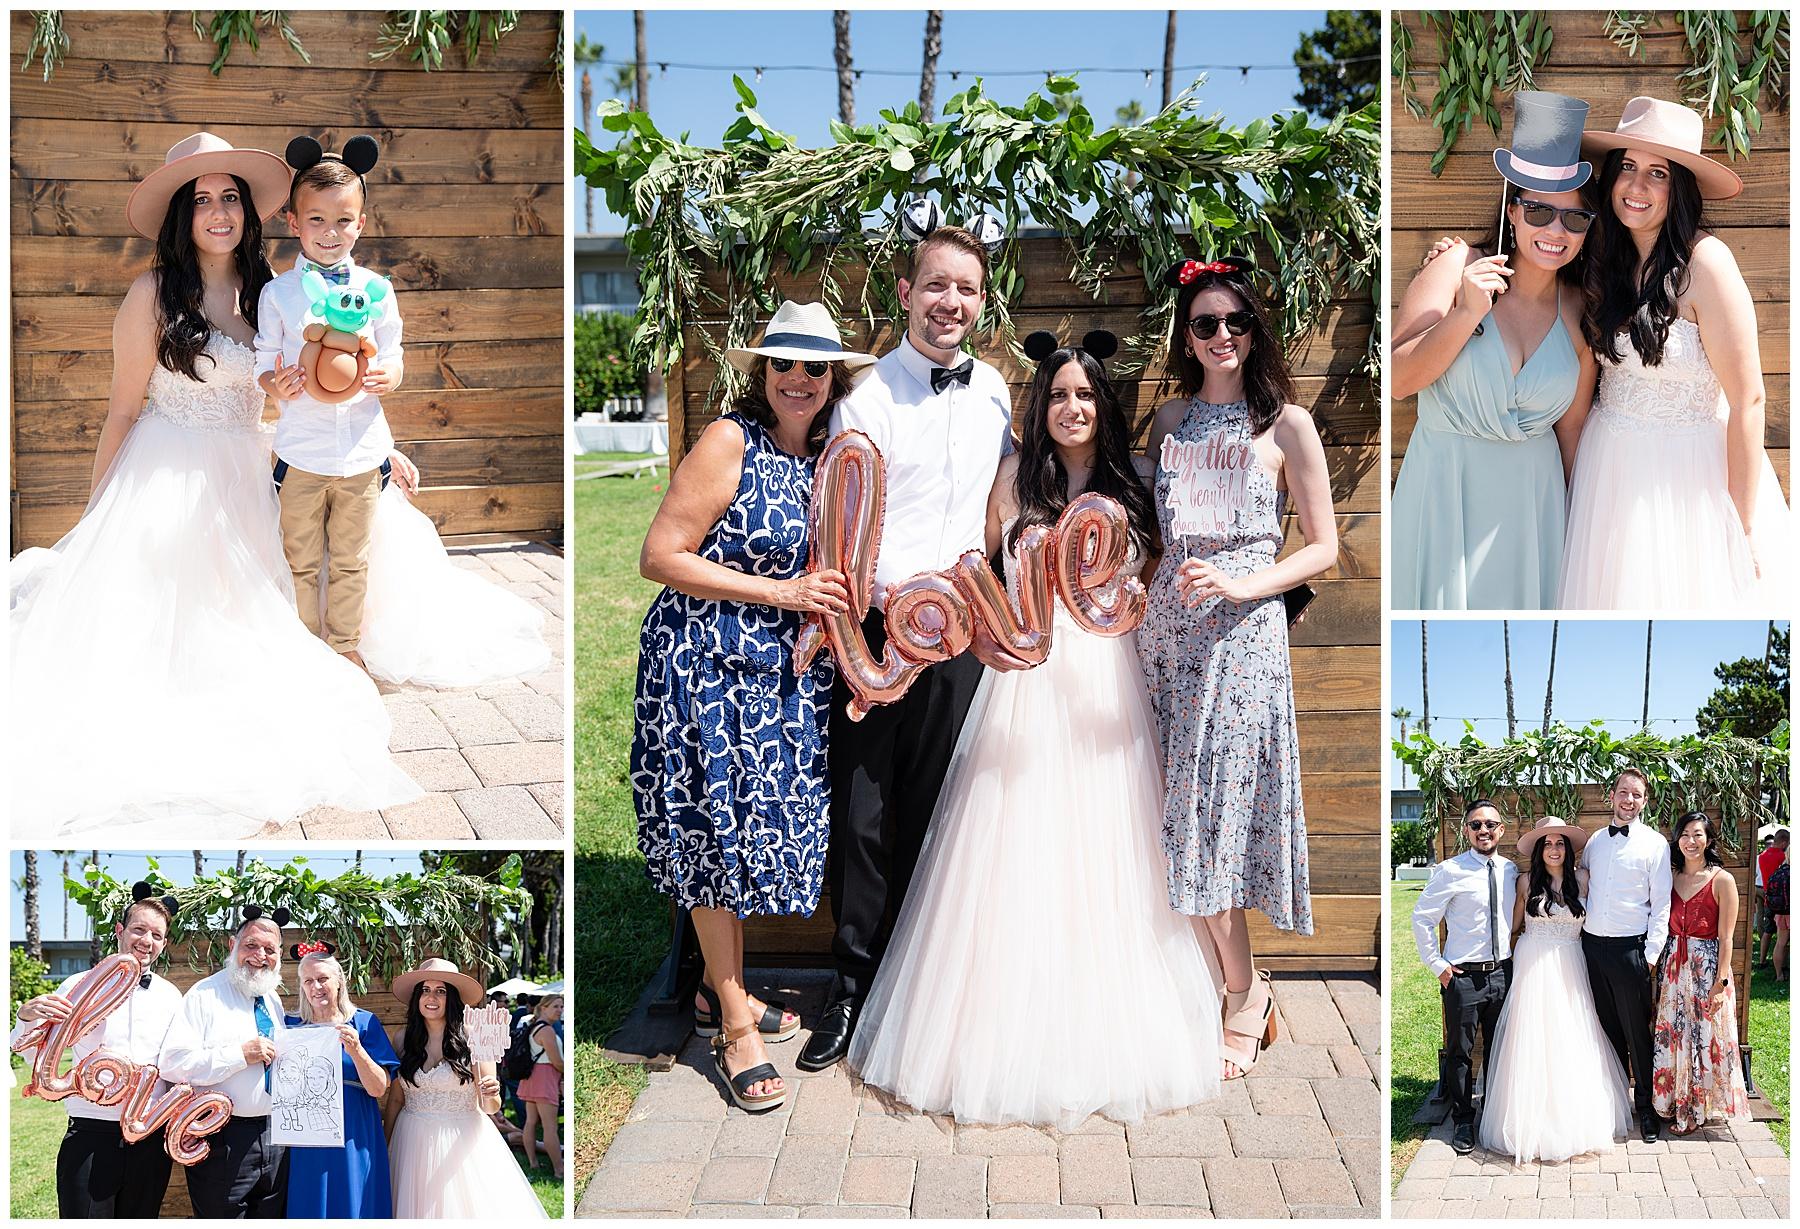 wedding day photo wall